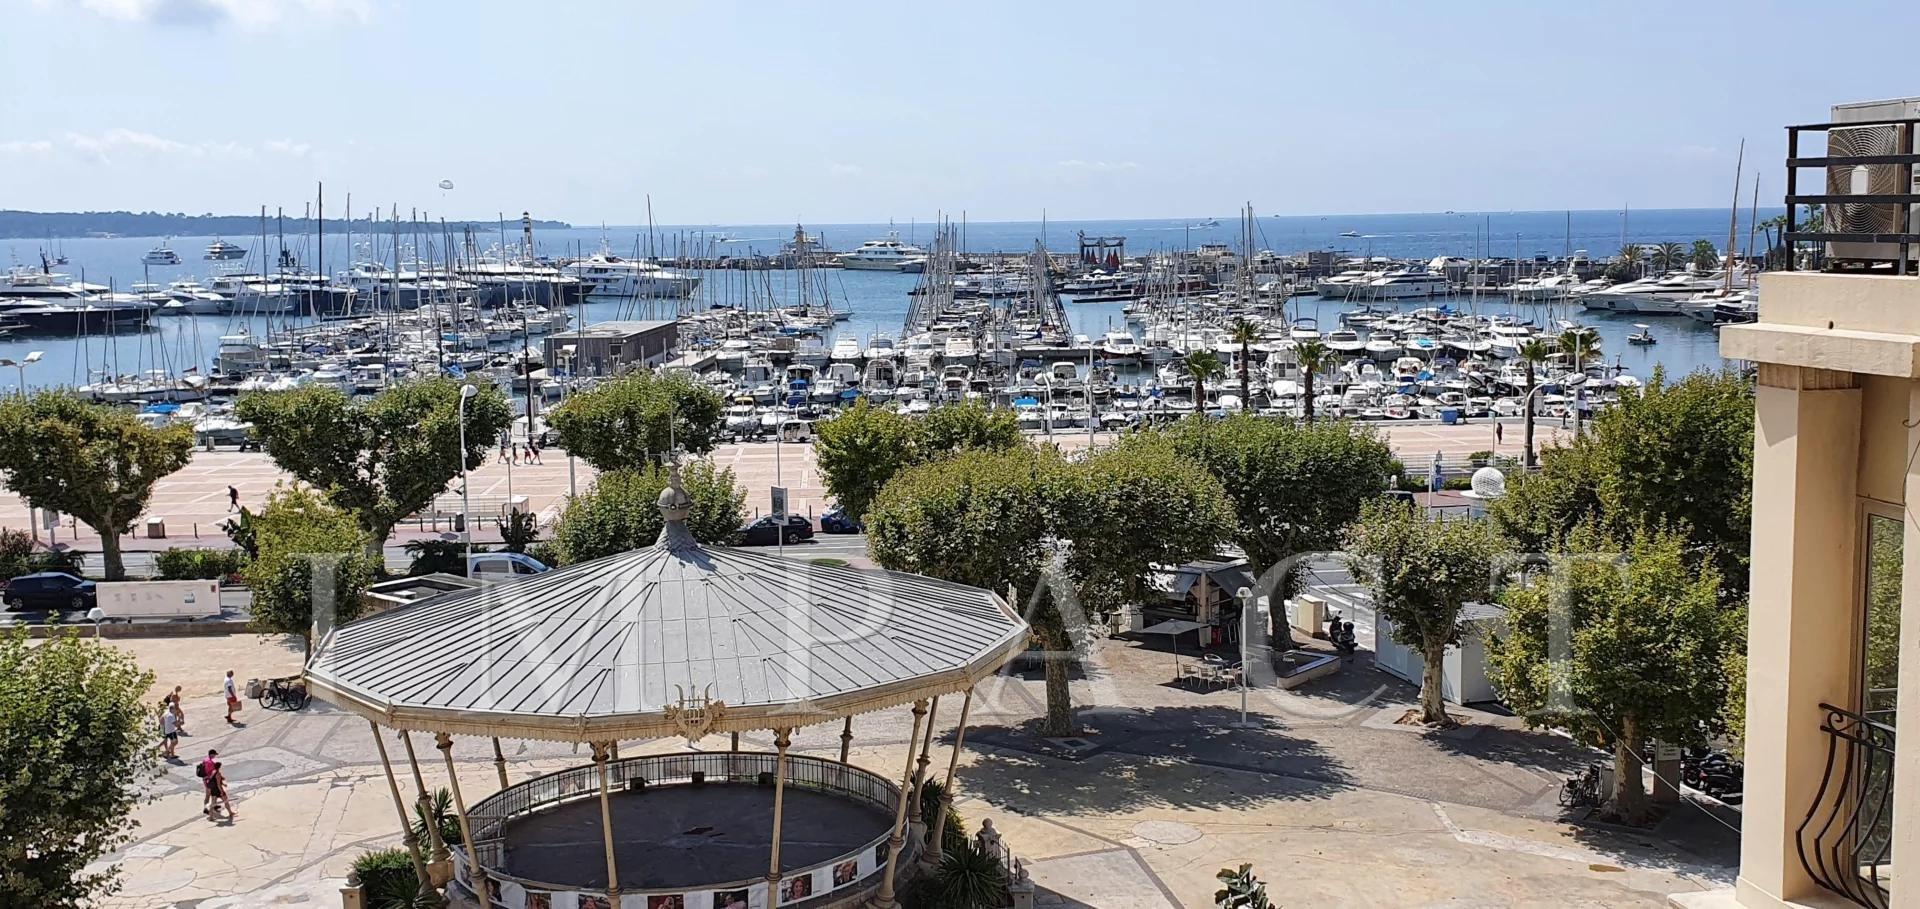 3 bedrooms duplex apartment for sale - Cannes Sea view